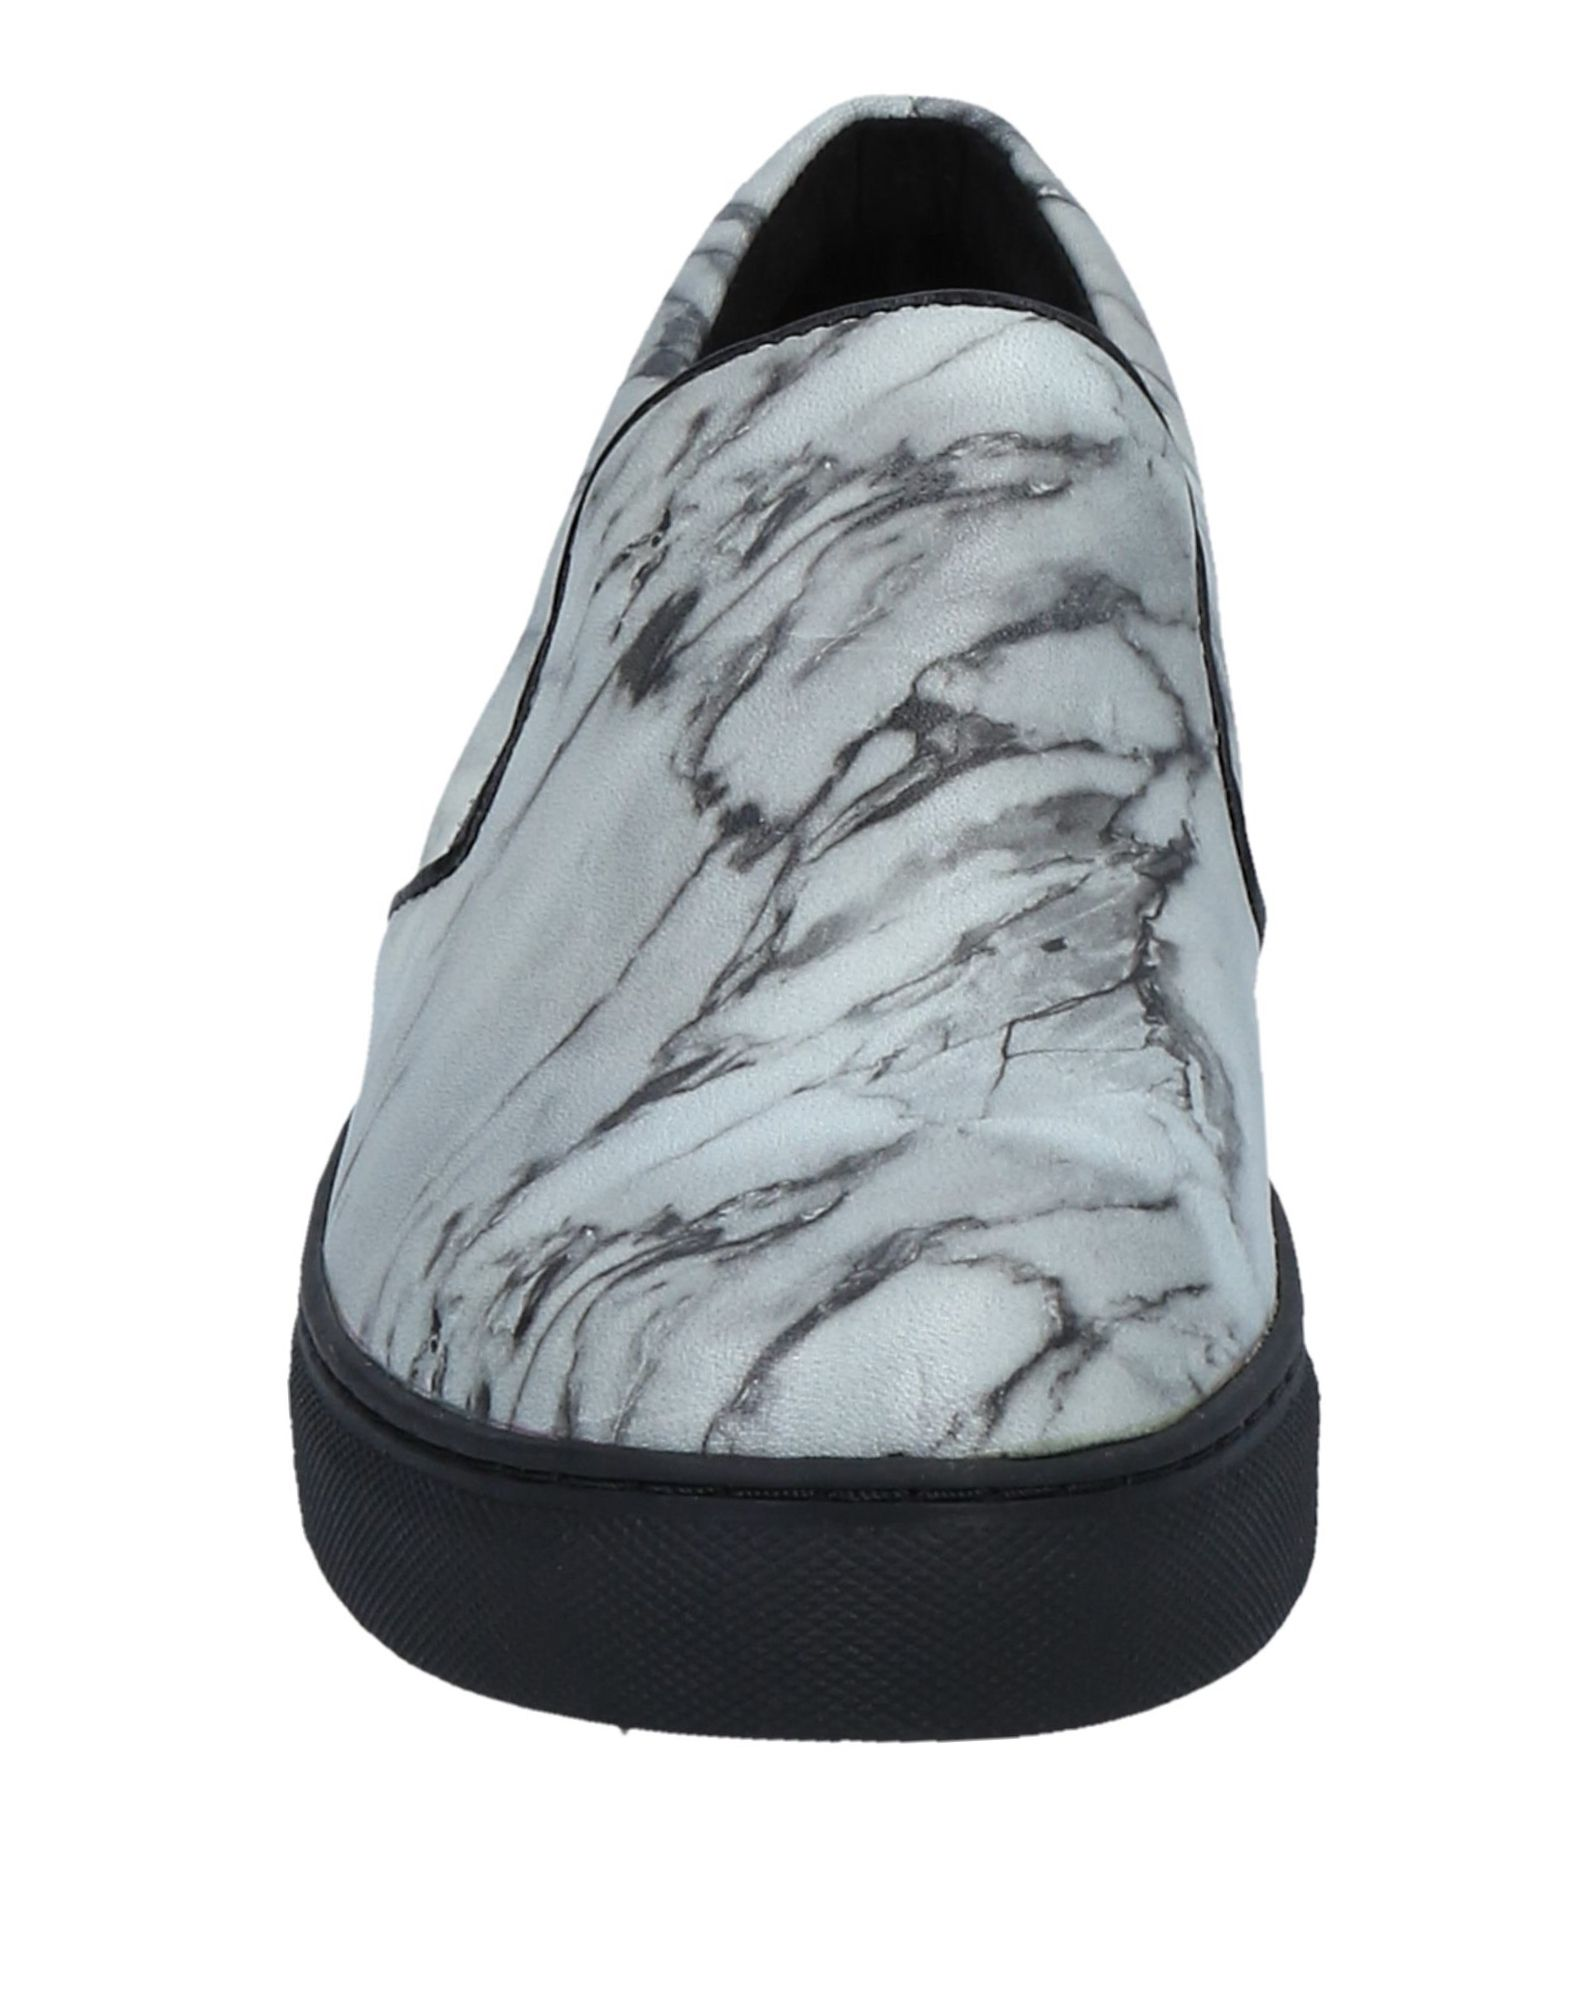 Mi/Mai Sneakers Damen  11505755OJ Gute Qualität beliebte Schuhe